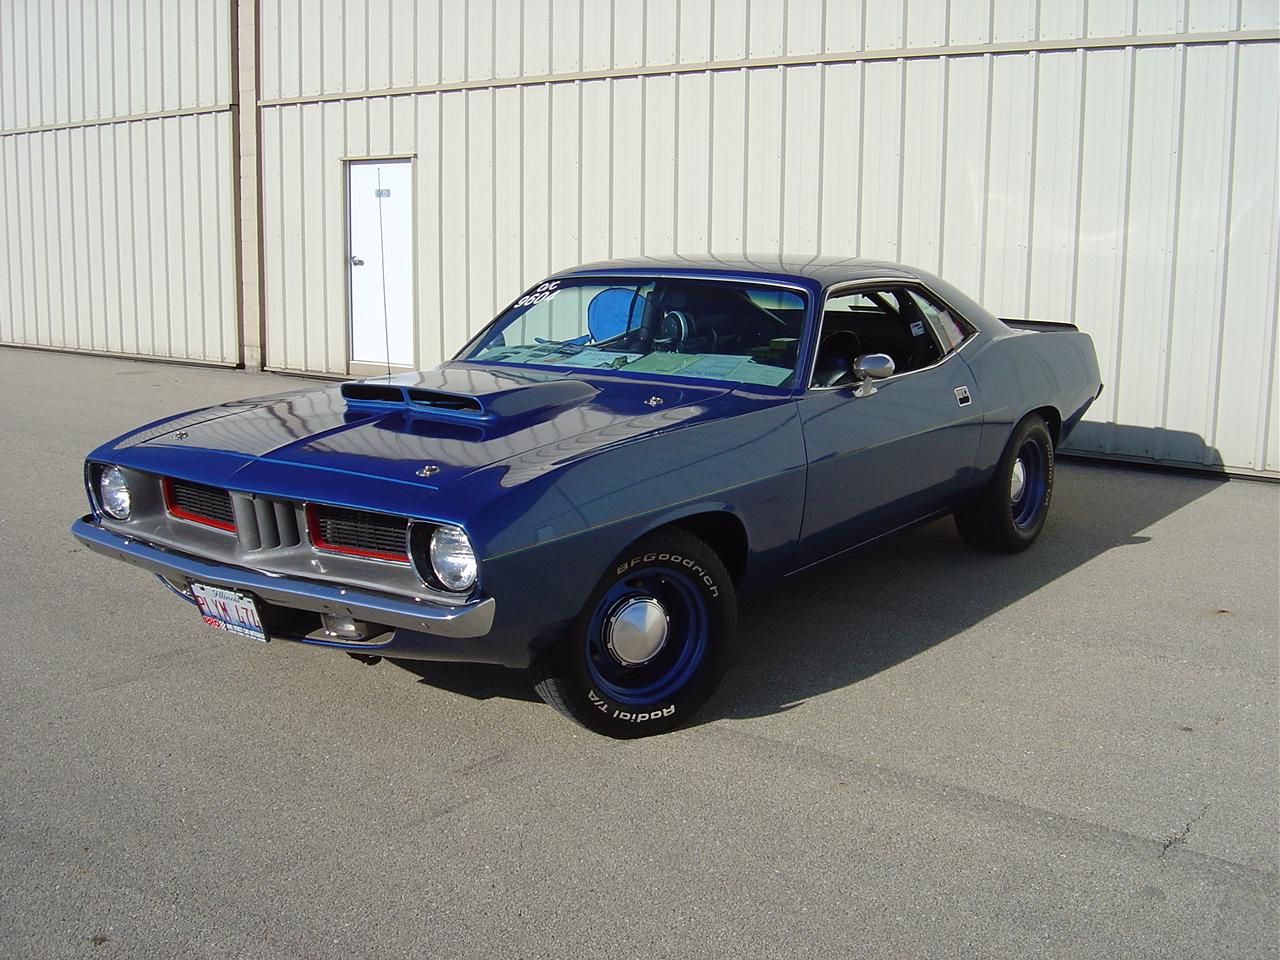 barracuda car 1974 - photo #8